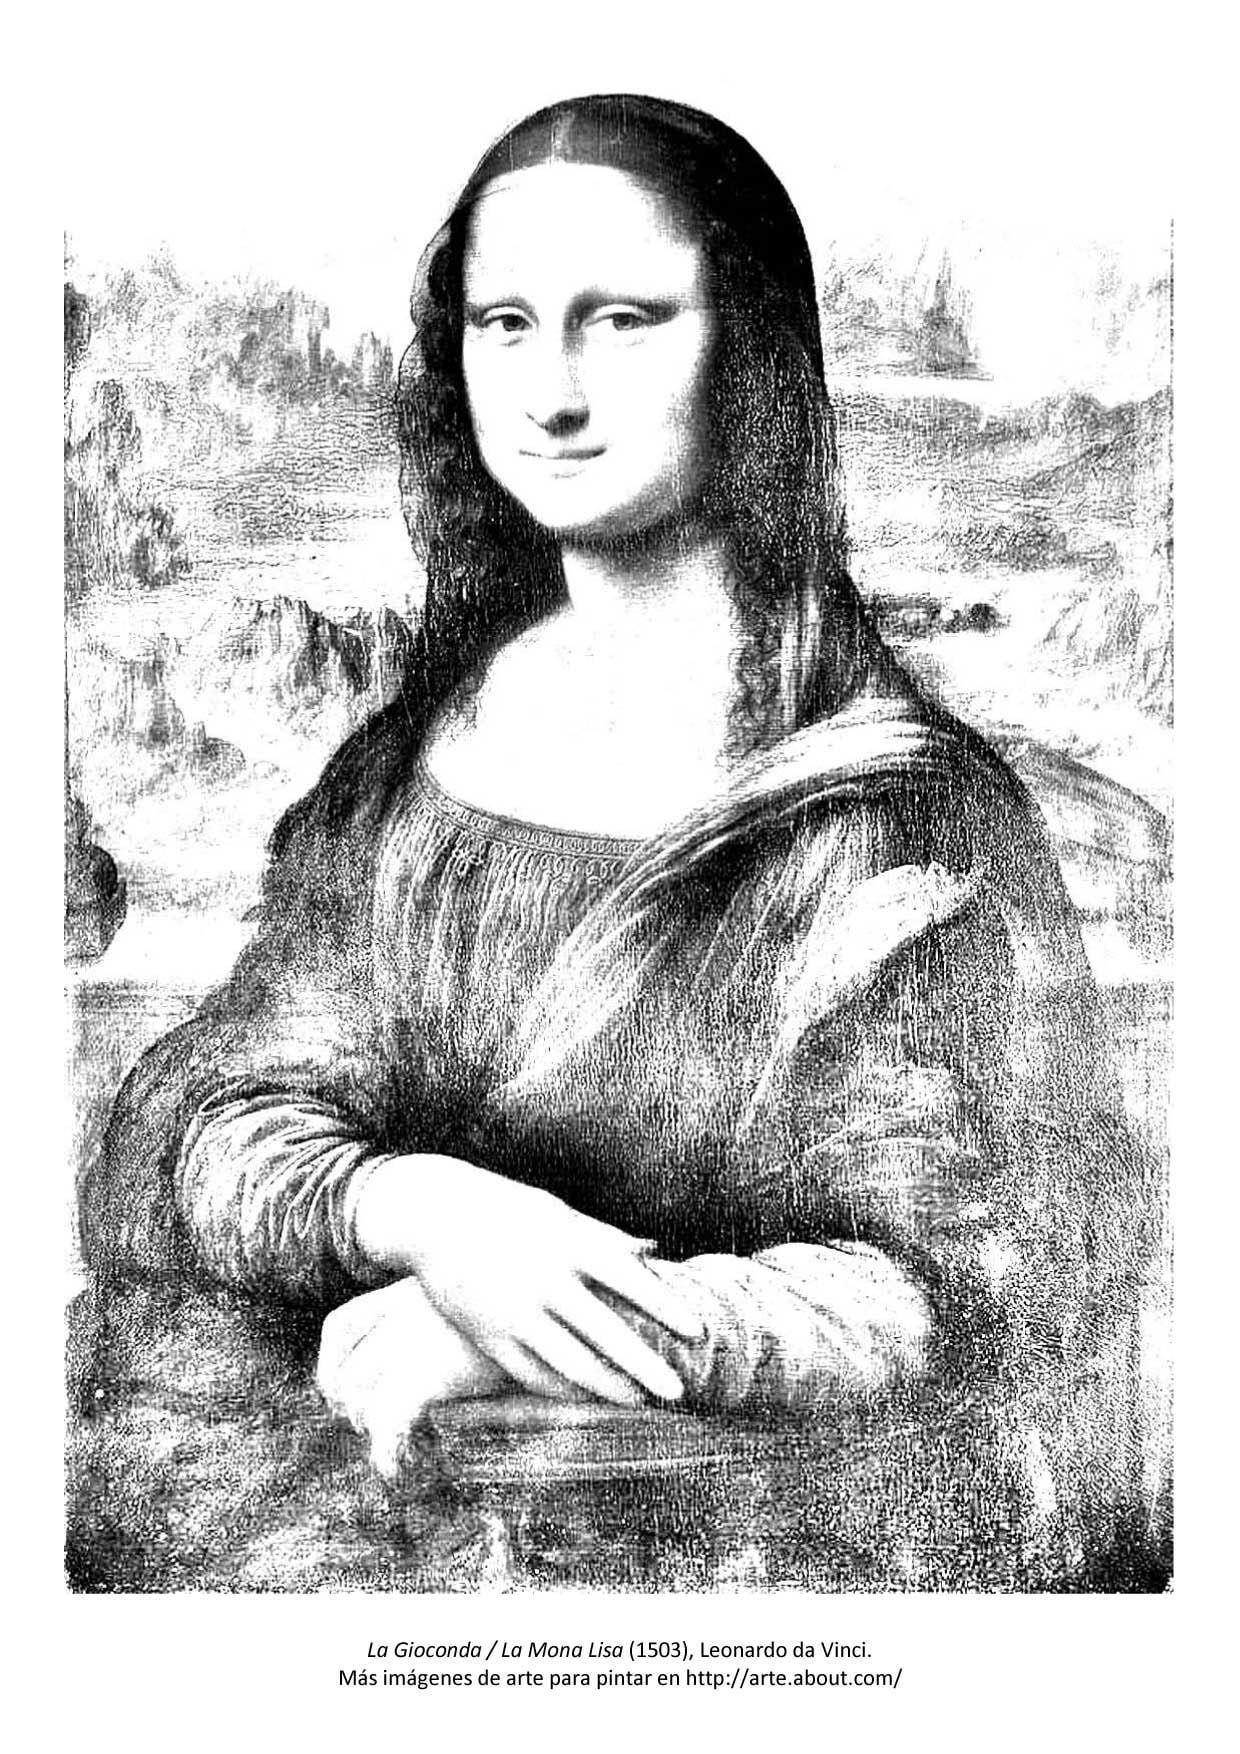 Pintar un cuadro | Before i die | Pinterest | Mona lisa, Pintar y Cuadro